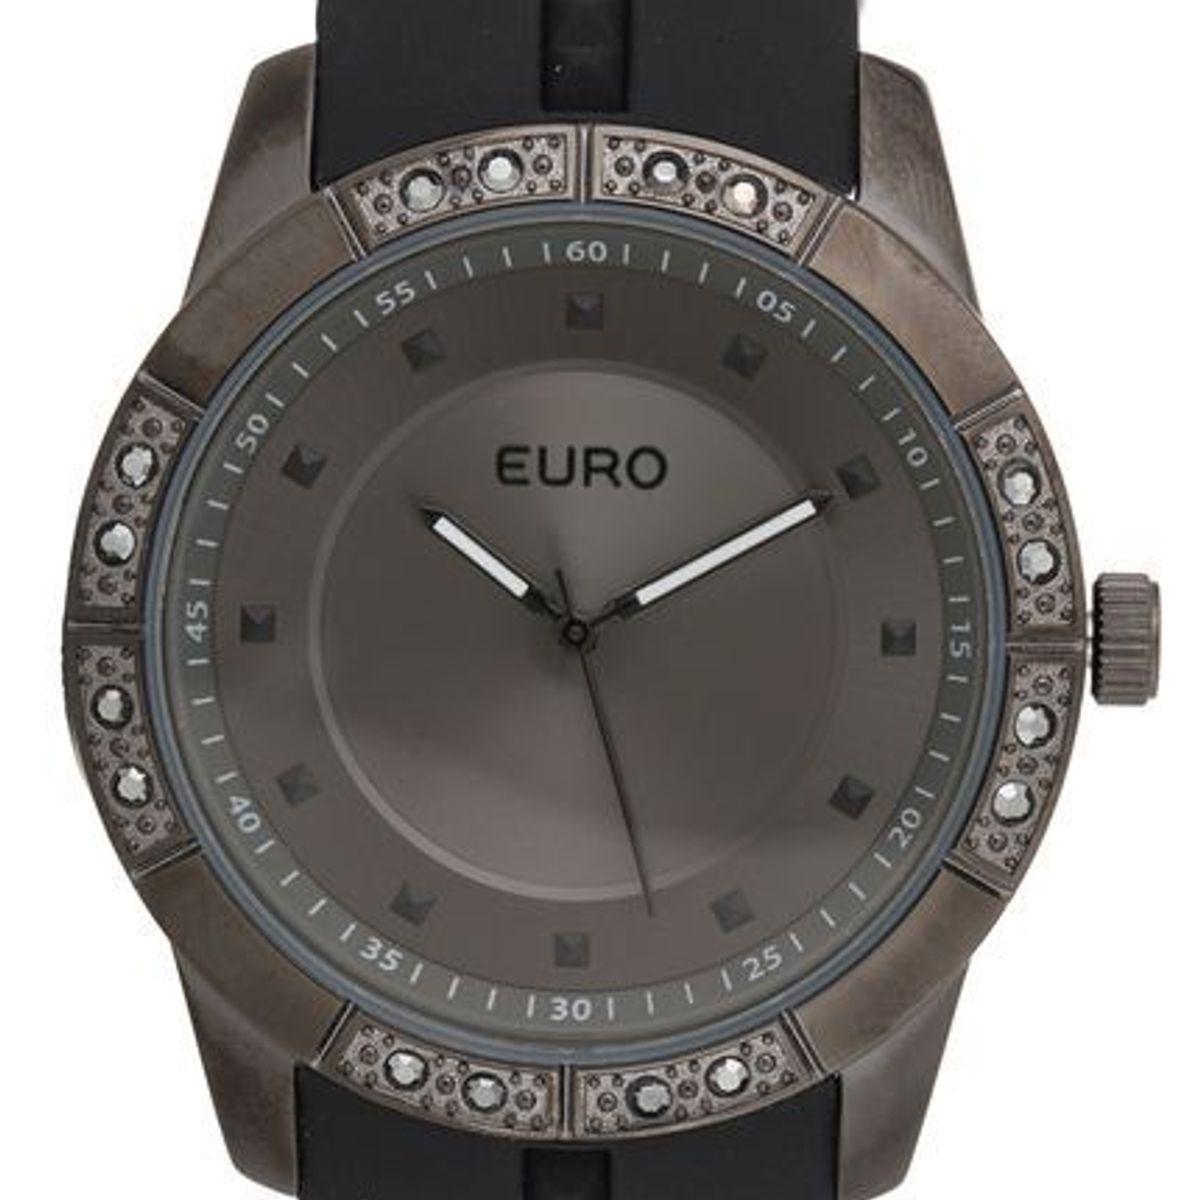 682df723a57 Relógio Feminino Euro Analógico Fashion Fit Sabrina Sato - Eu2036yela 8d -  Preto